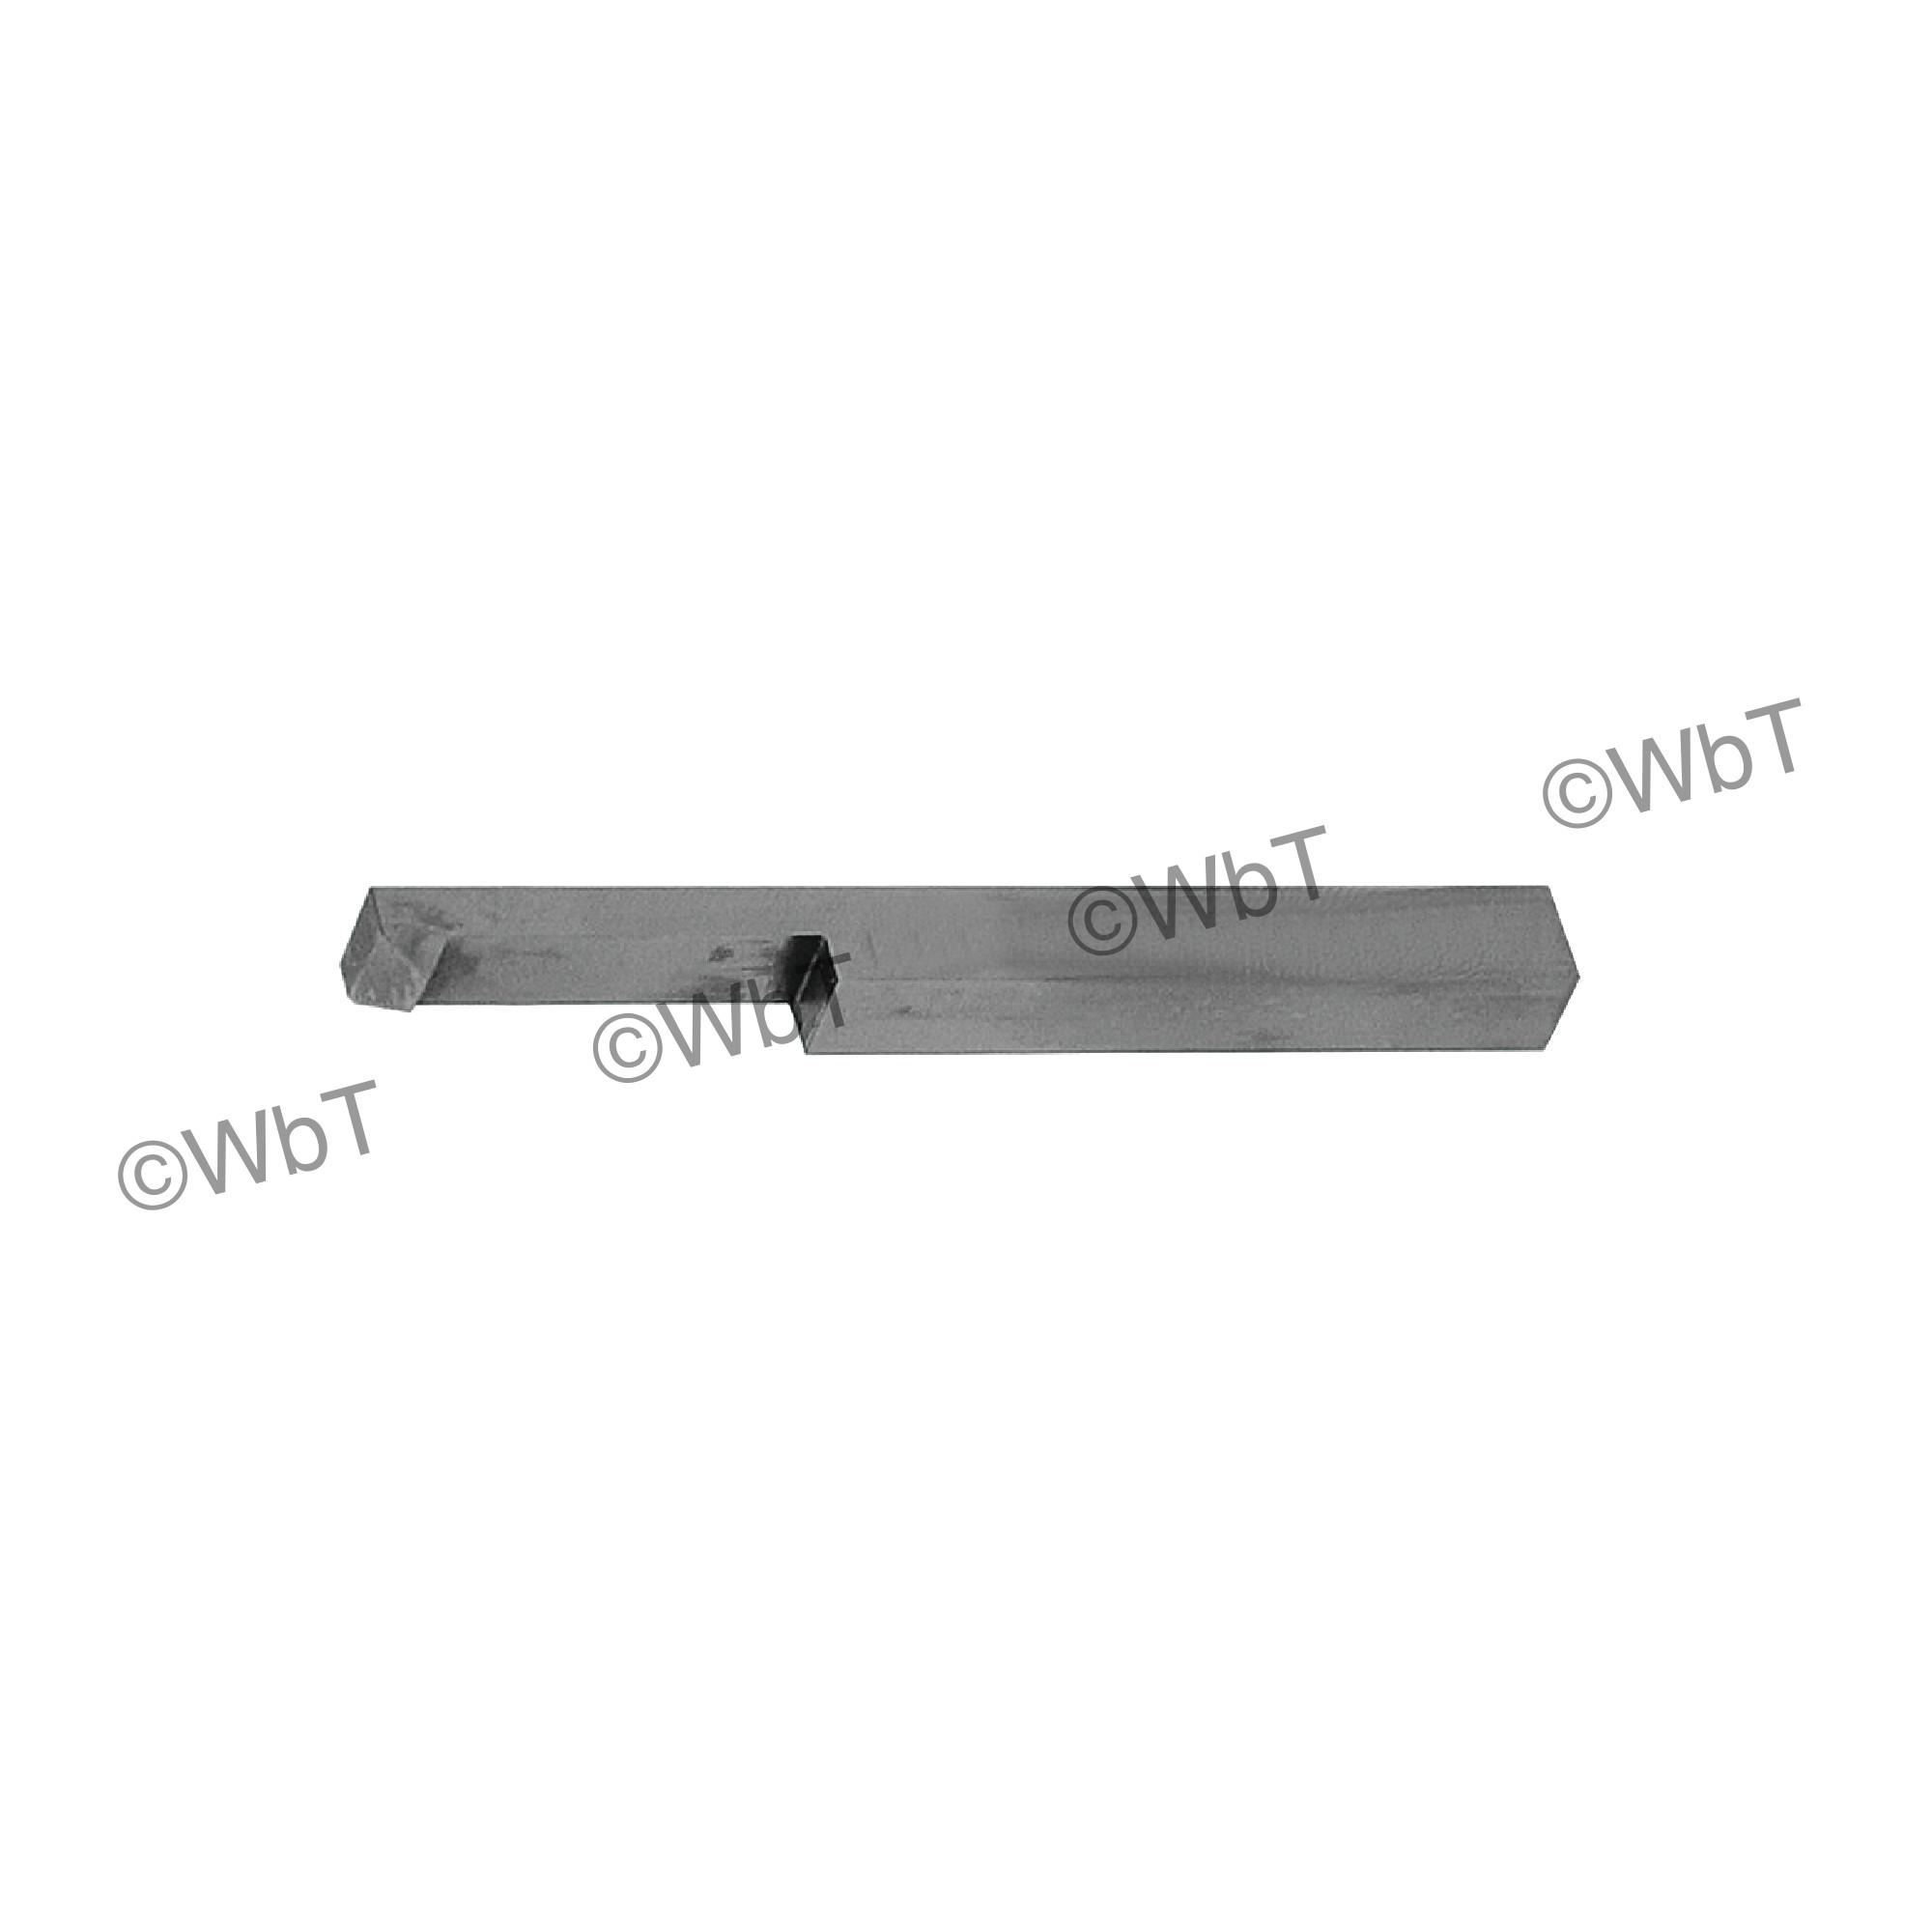 "1/2"" Internal Threading Tool High Speed Steel Lathe Tool"